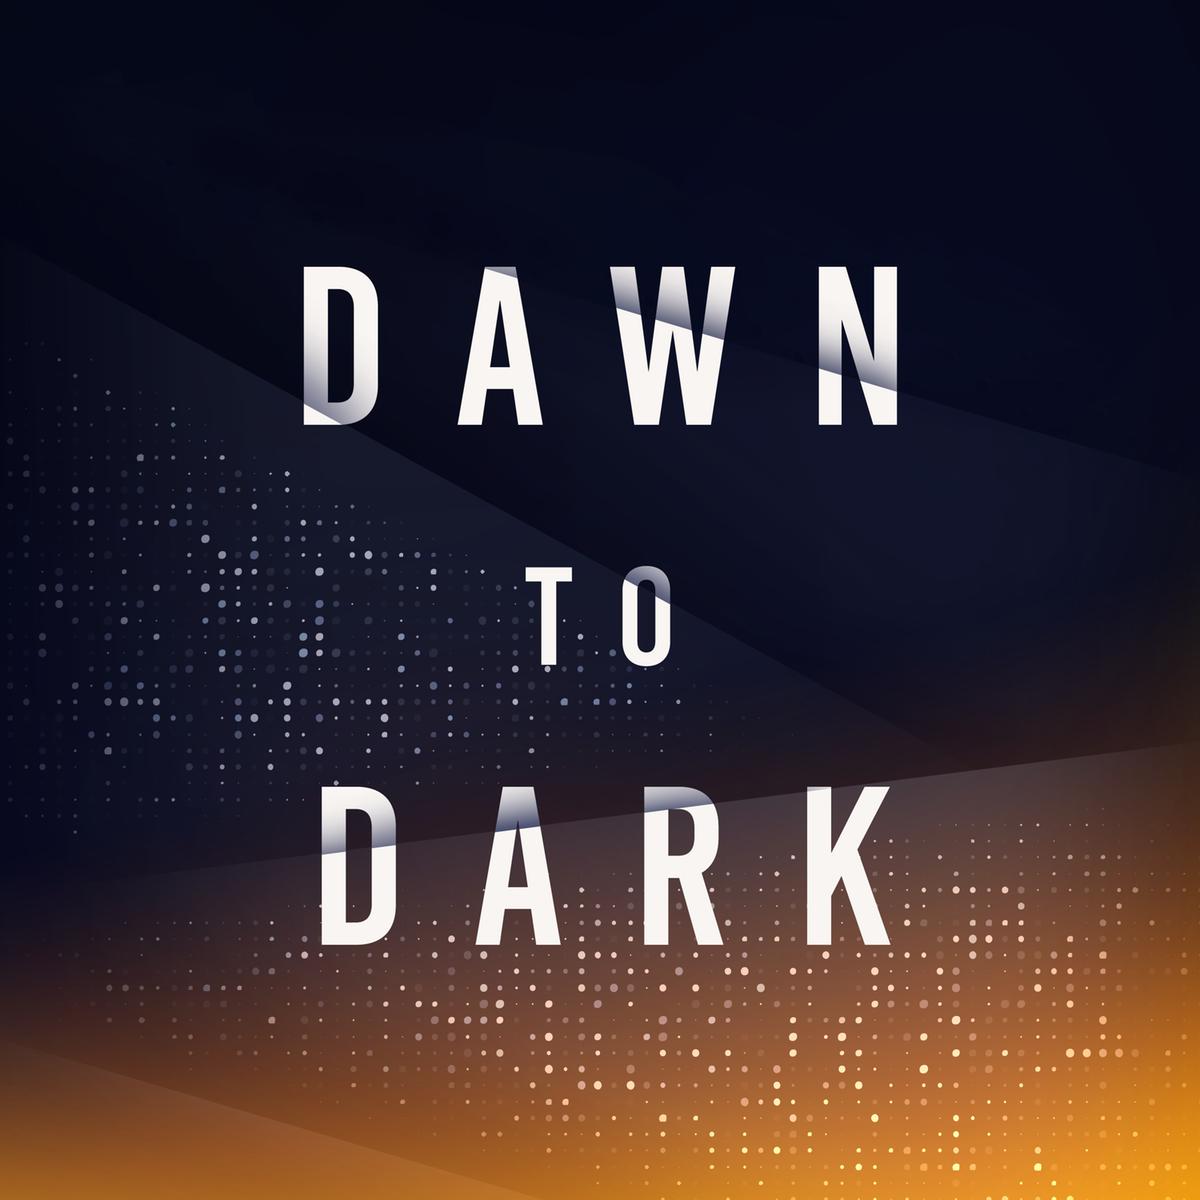 Logo for Audio Drama podcast